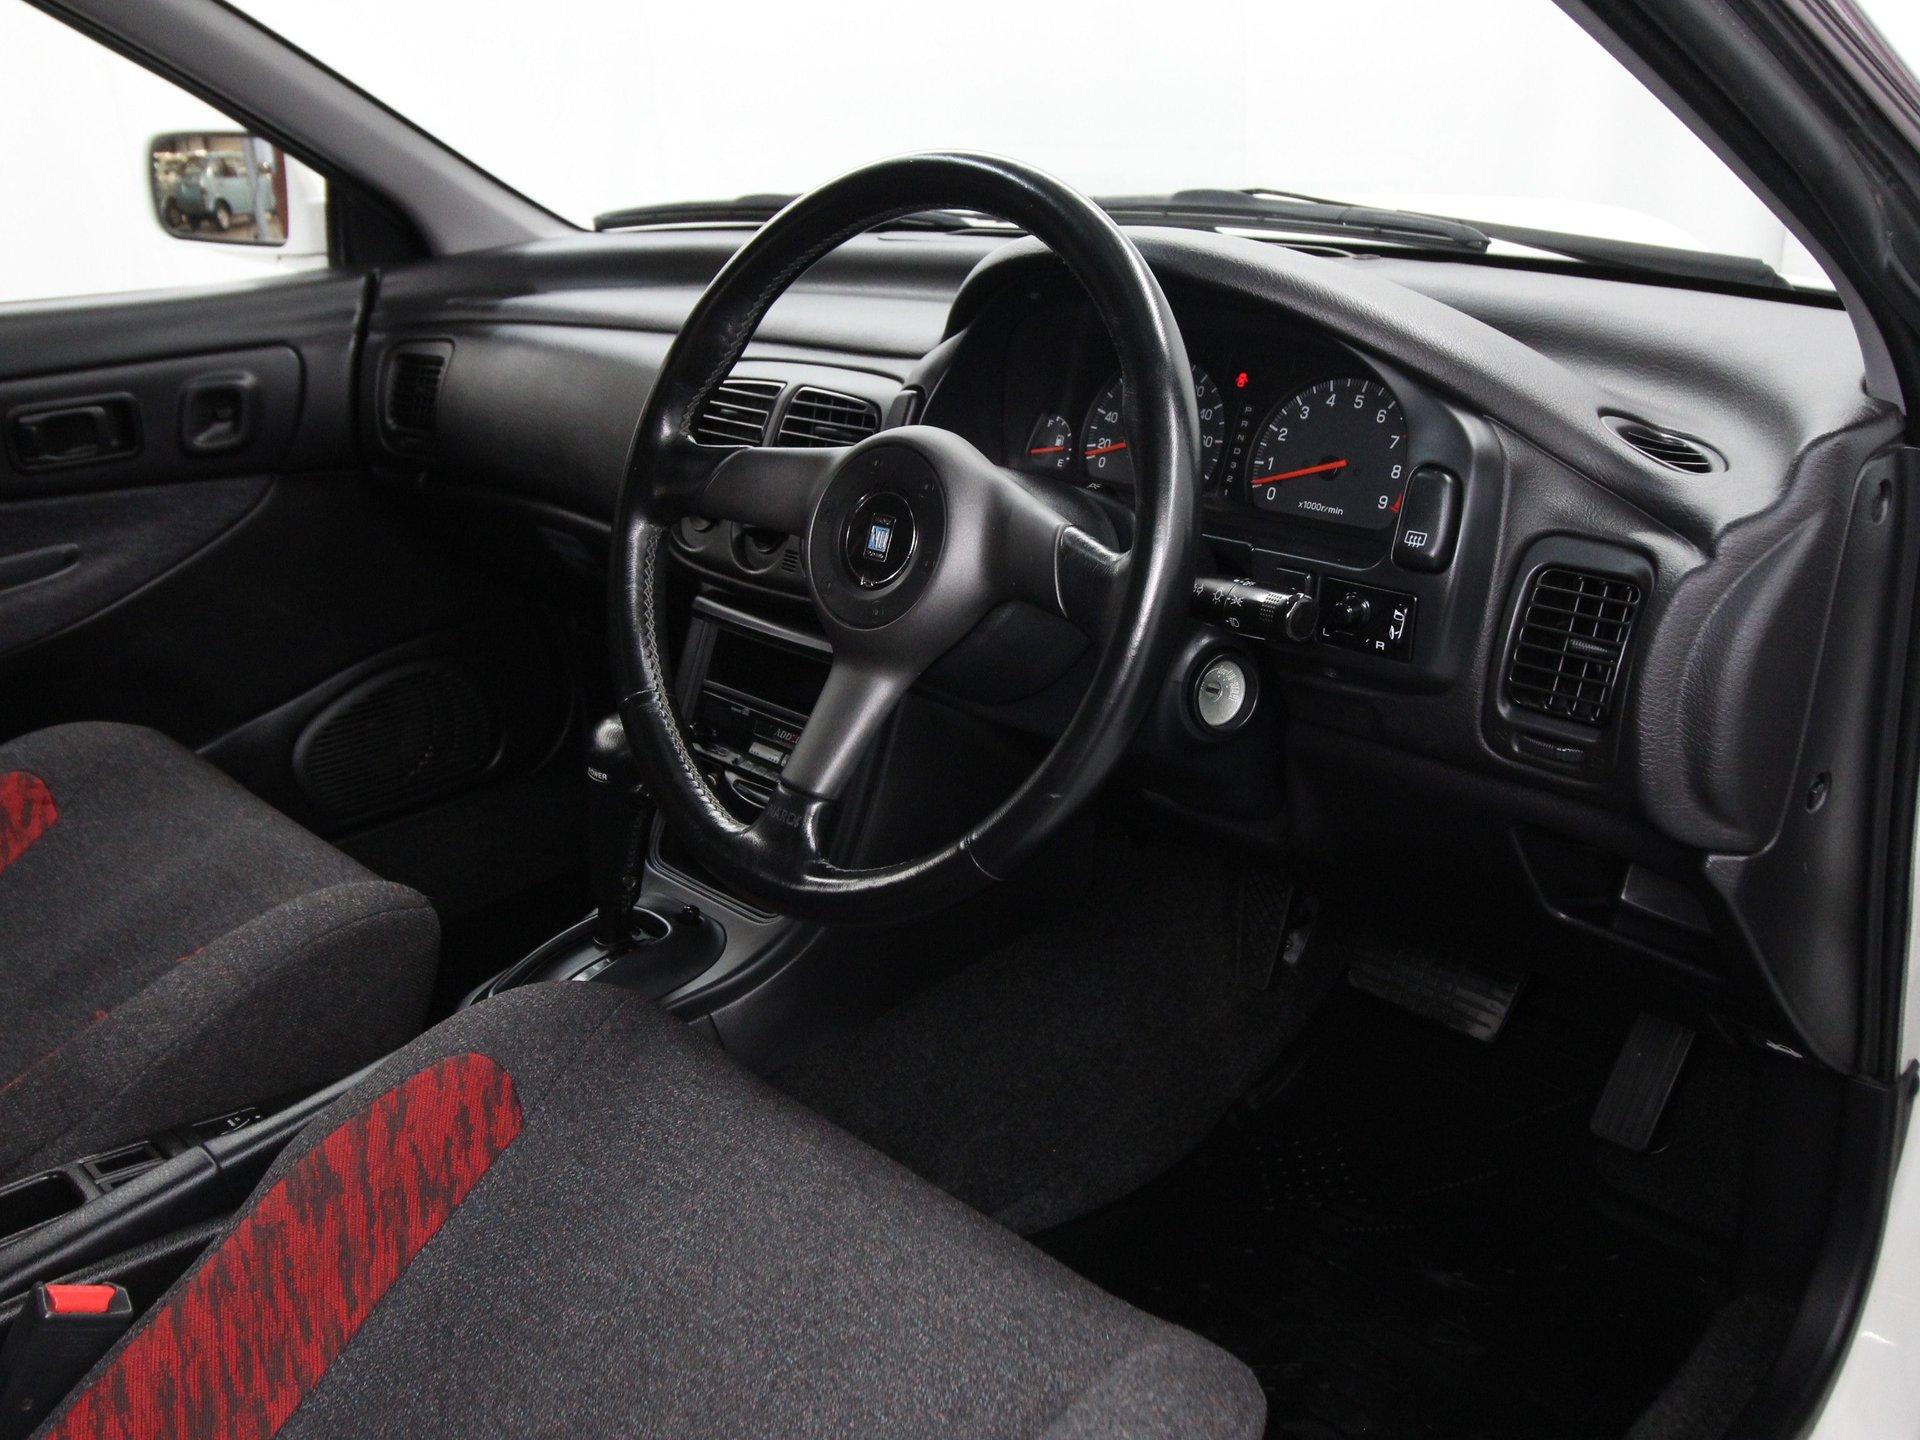 1993 Subaru Impreza